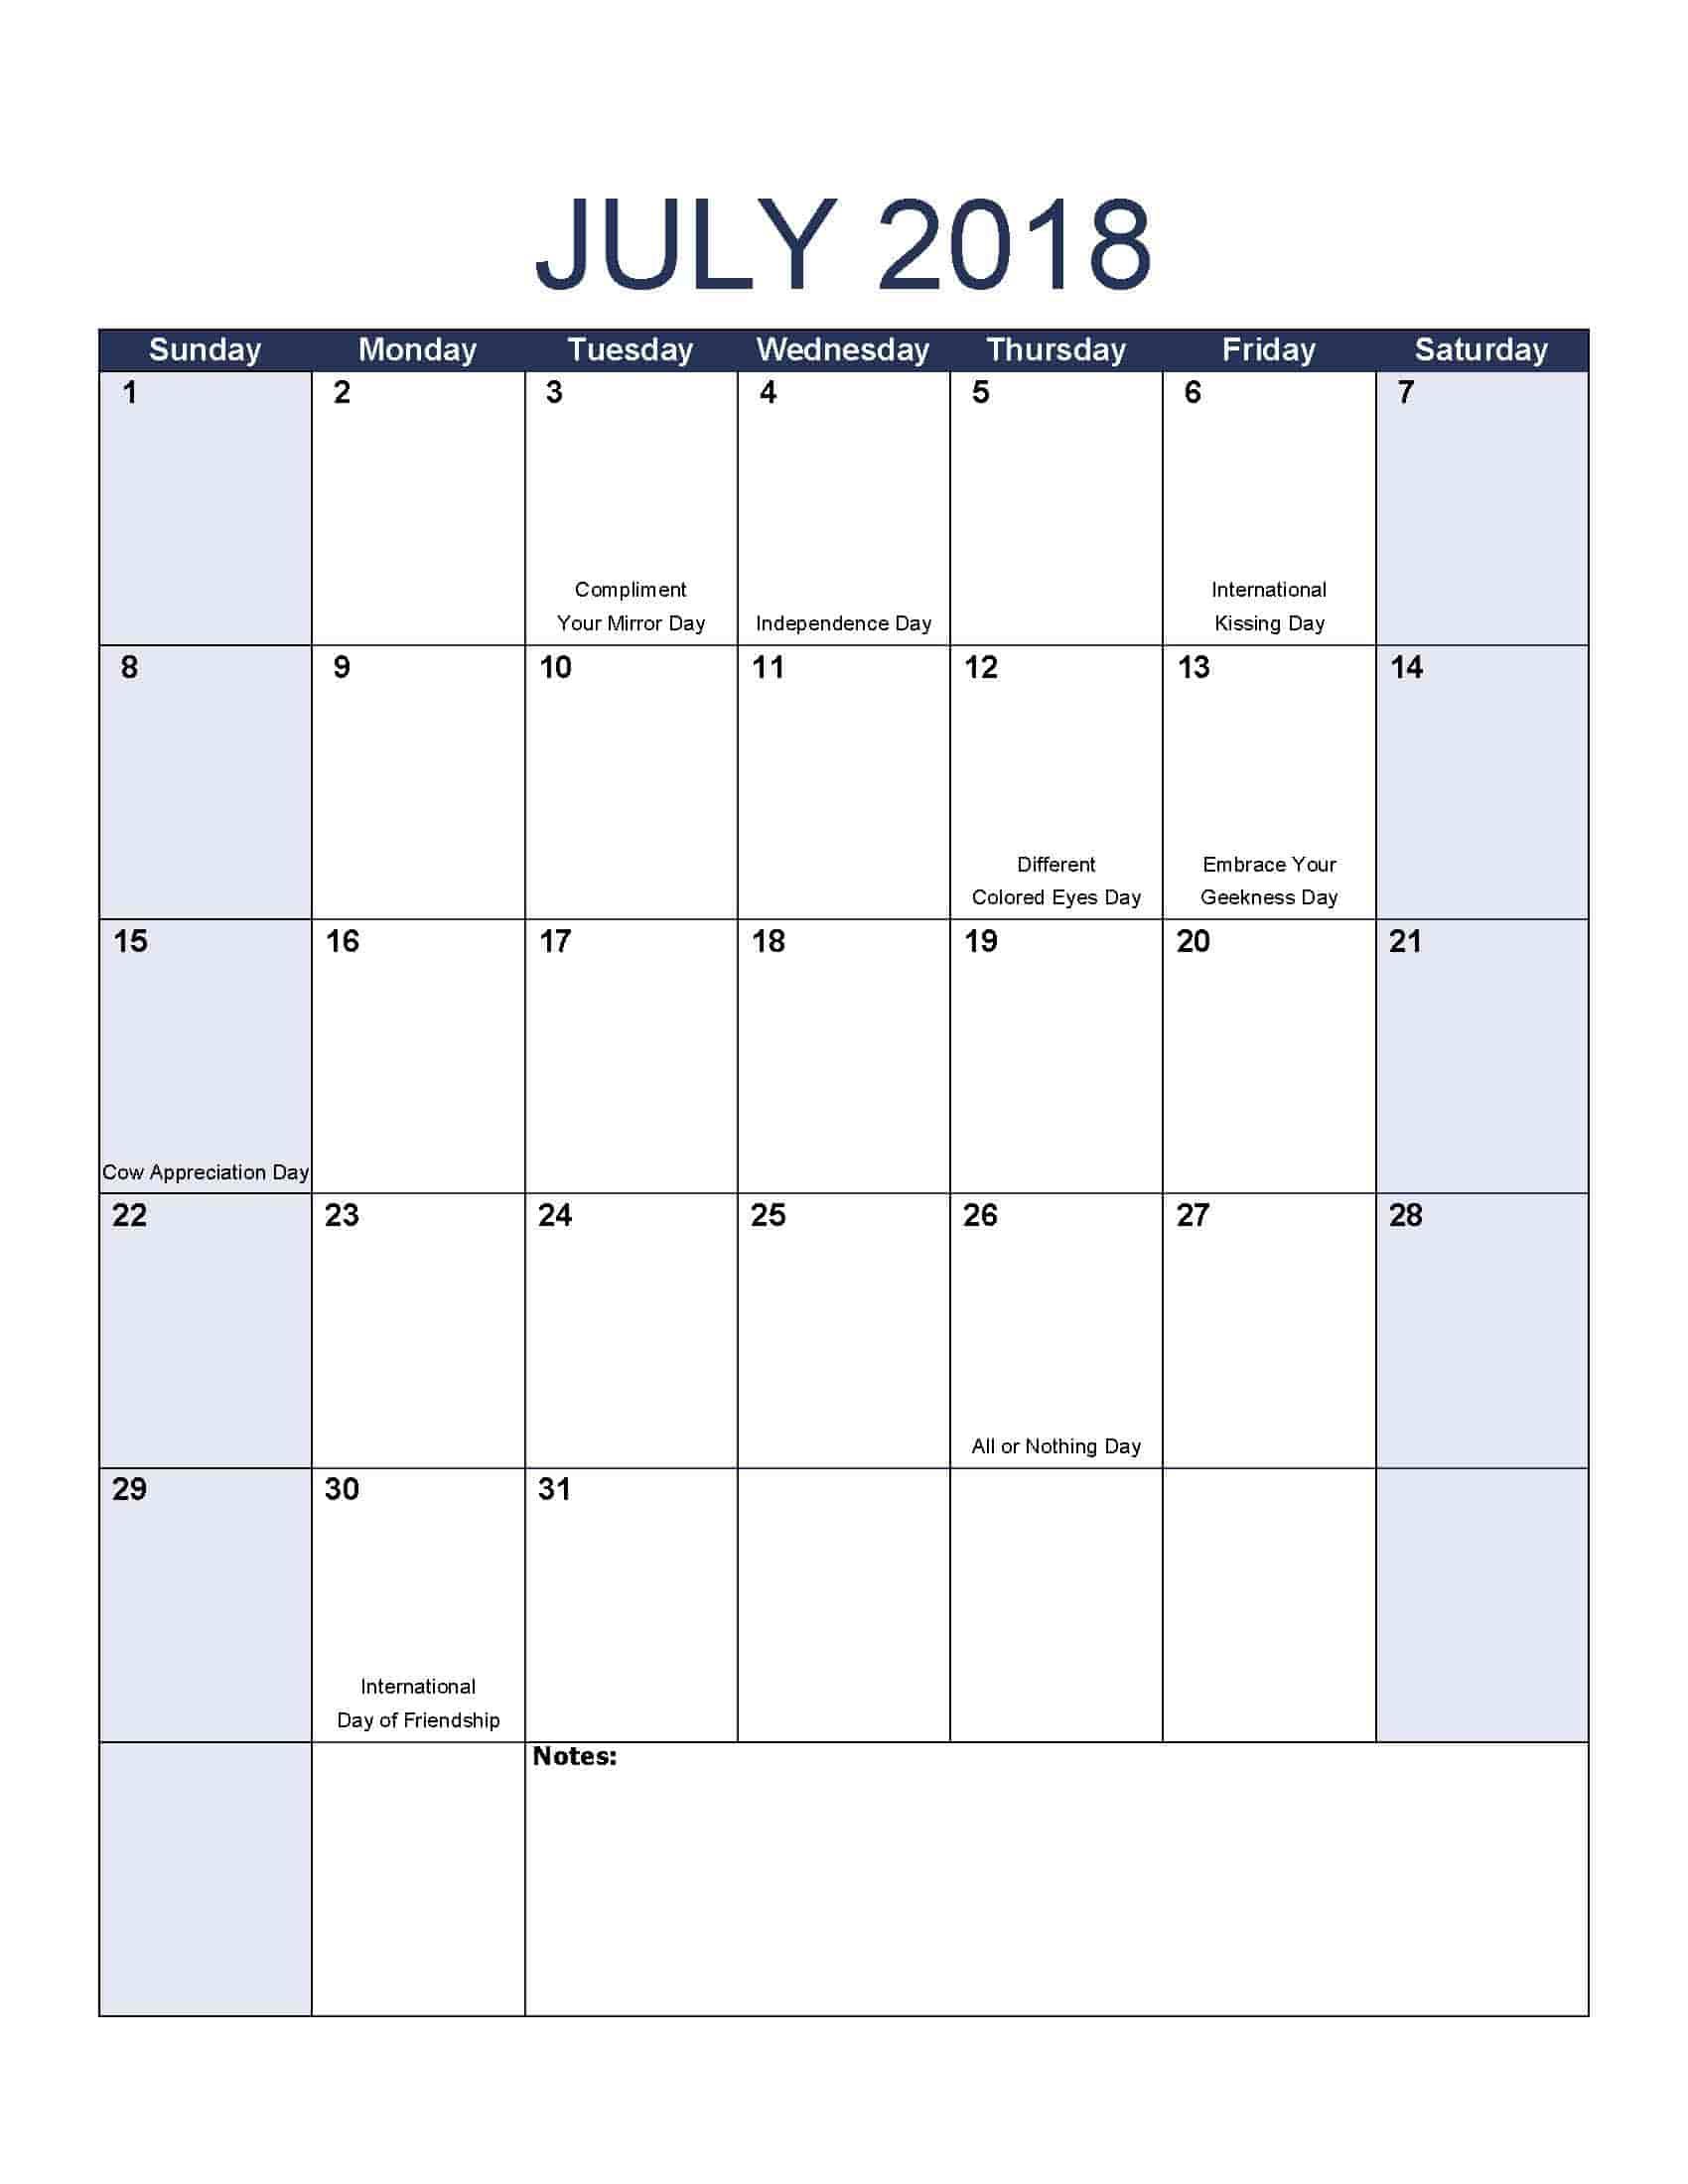 July 2018 Calendar - Free, Printable Calendar Templates